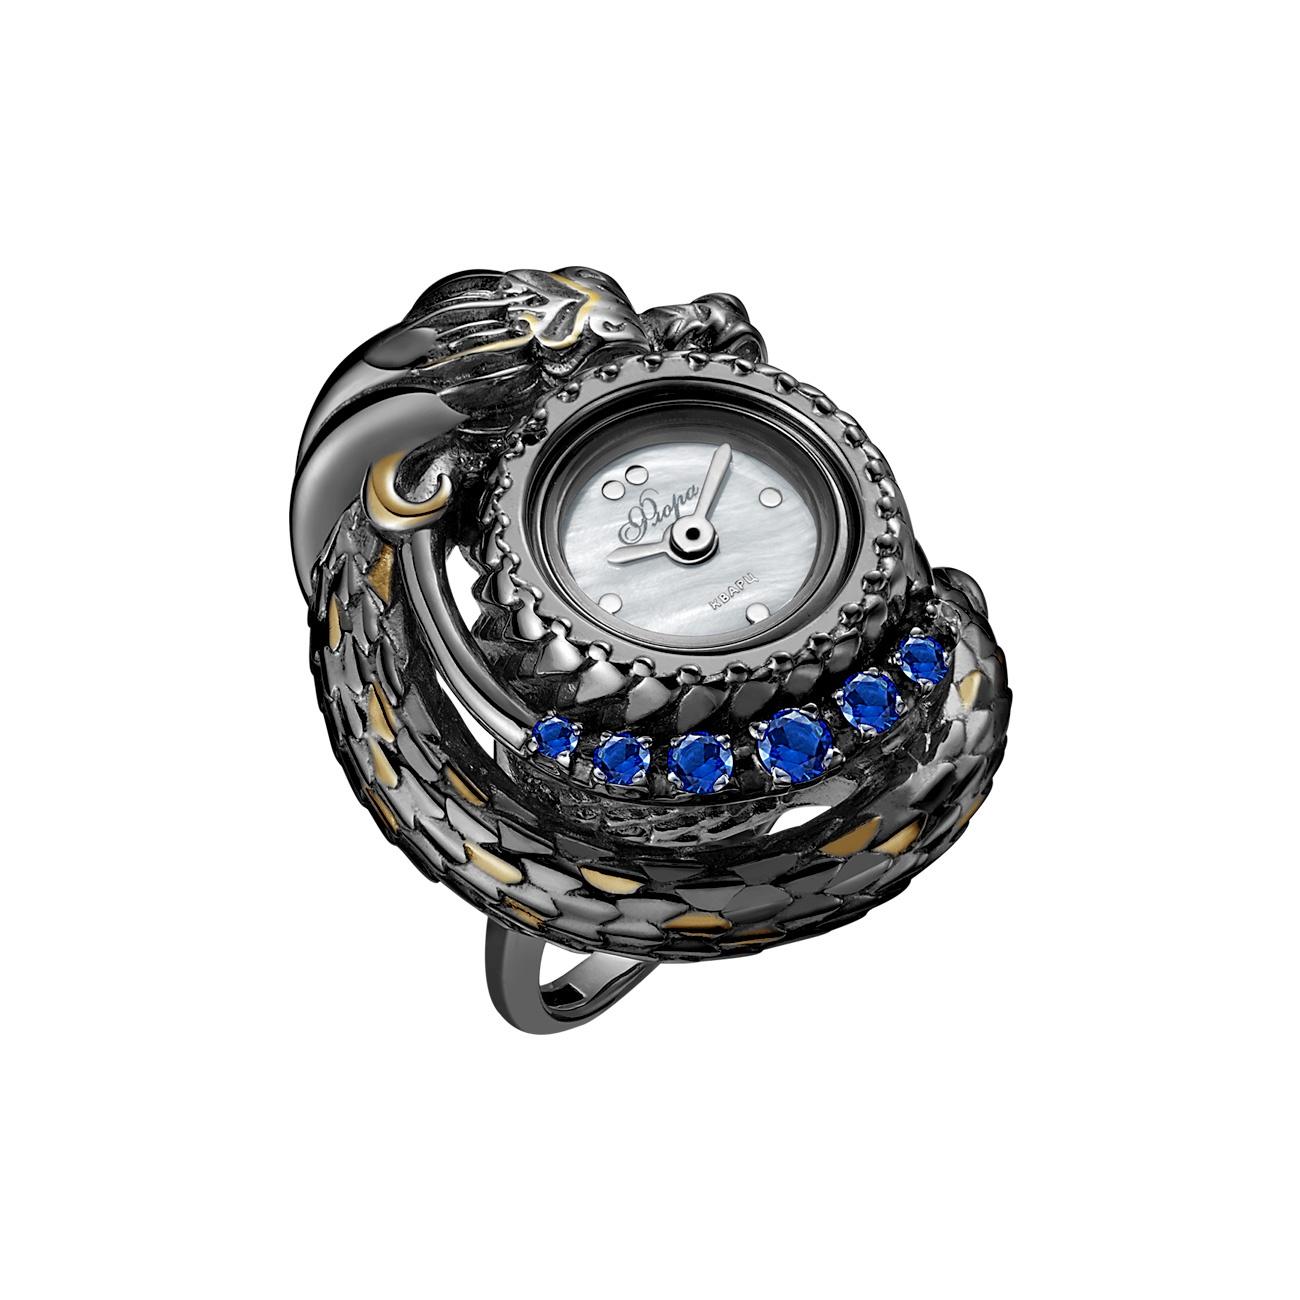 Кольцо бижутерное Mikhail Moskvin 1265S2-K1 Дракон, Серебро, Фианит, 18,5 будильник кварцевый mikhail moskvin цвет синий 2815 2